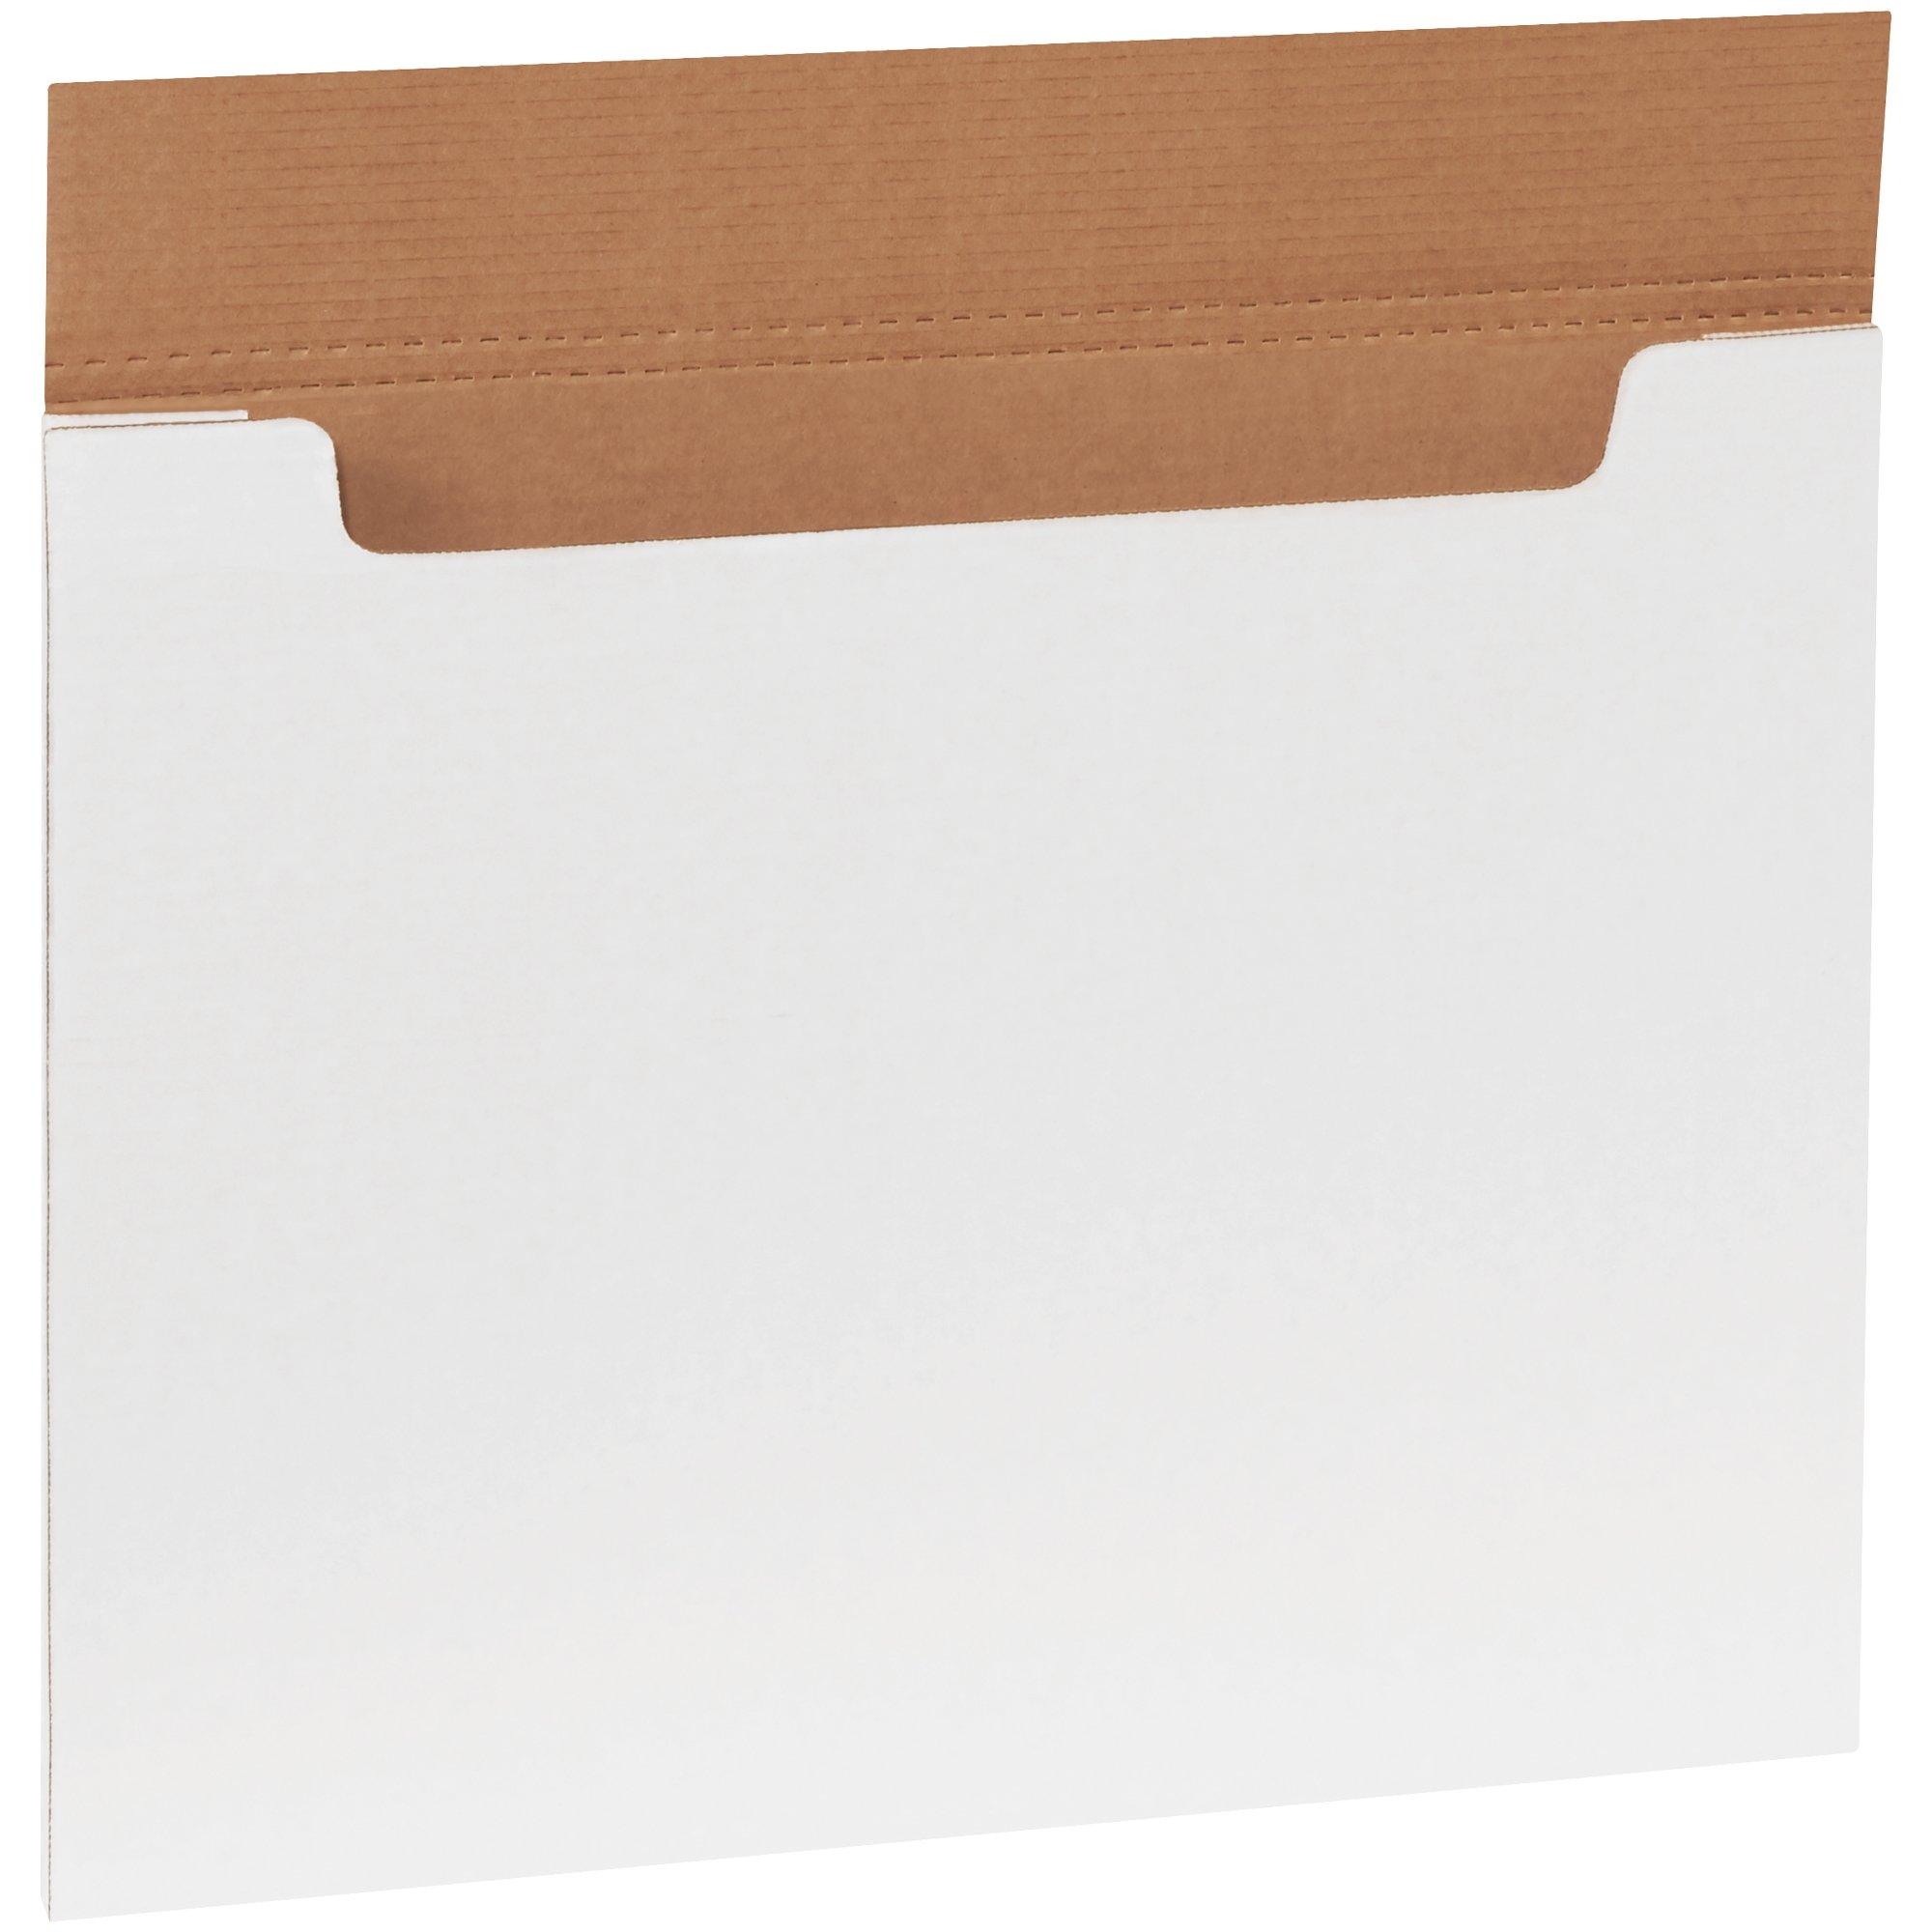 Aviditi M201614 Corrugated Jumbo Fold-Over Mailer, 20'' Length x 16'' Width x 1/4'' Height, White (Bundle of 20)